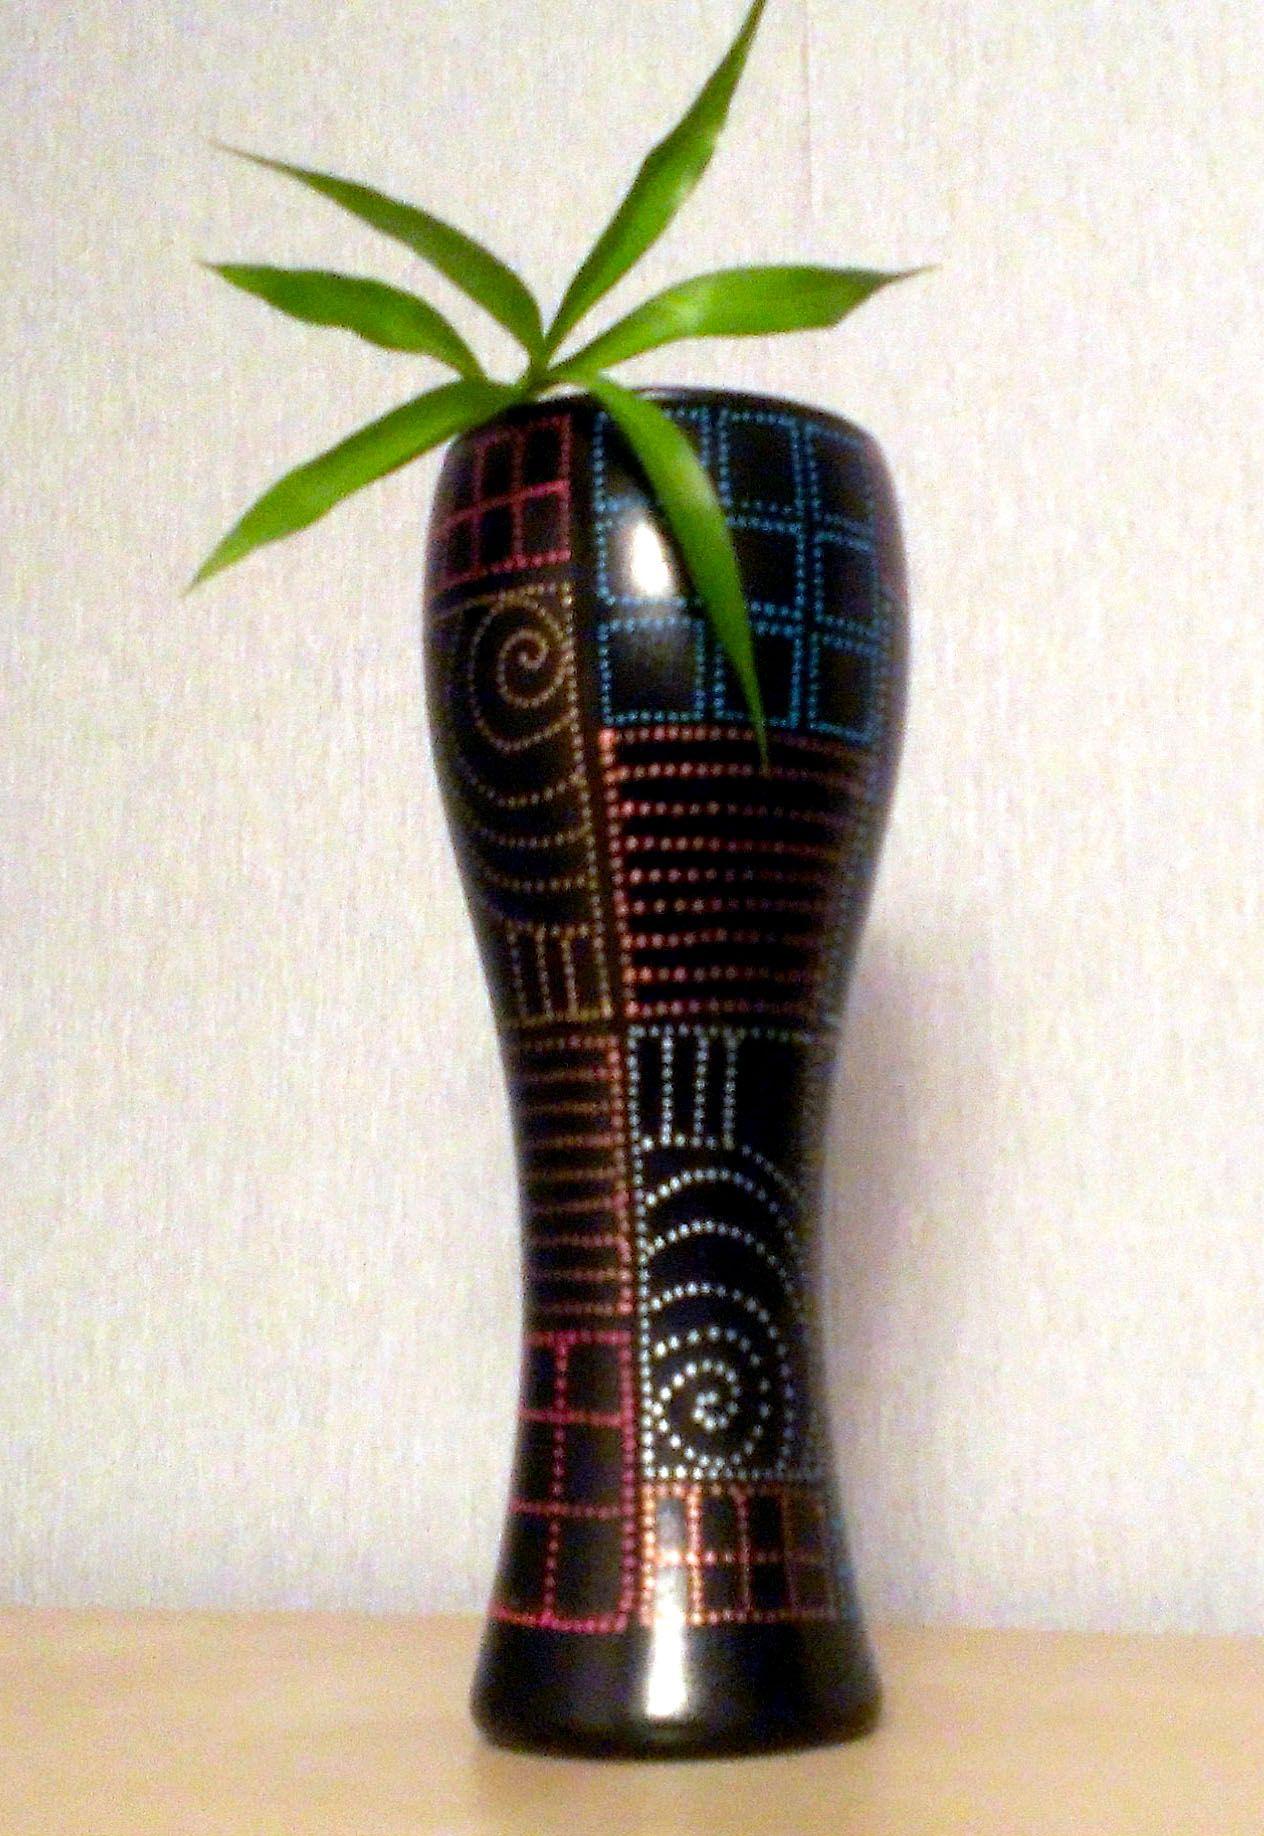 цветы декоративнаяваза узоры блюз handmade ваза тарелка точечнаяроспись декор декоративнаятарелка подарок ручнаяработа